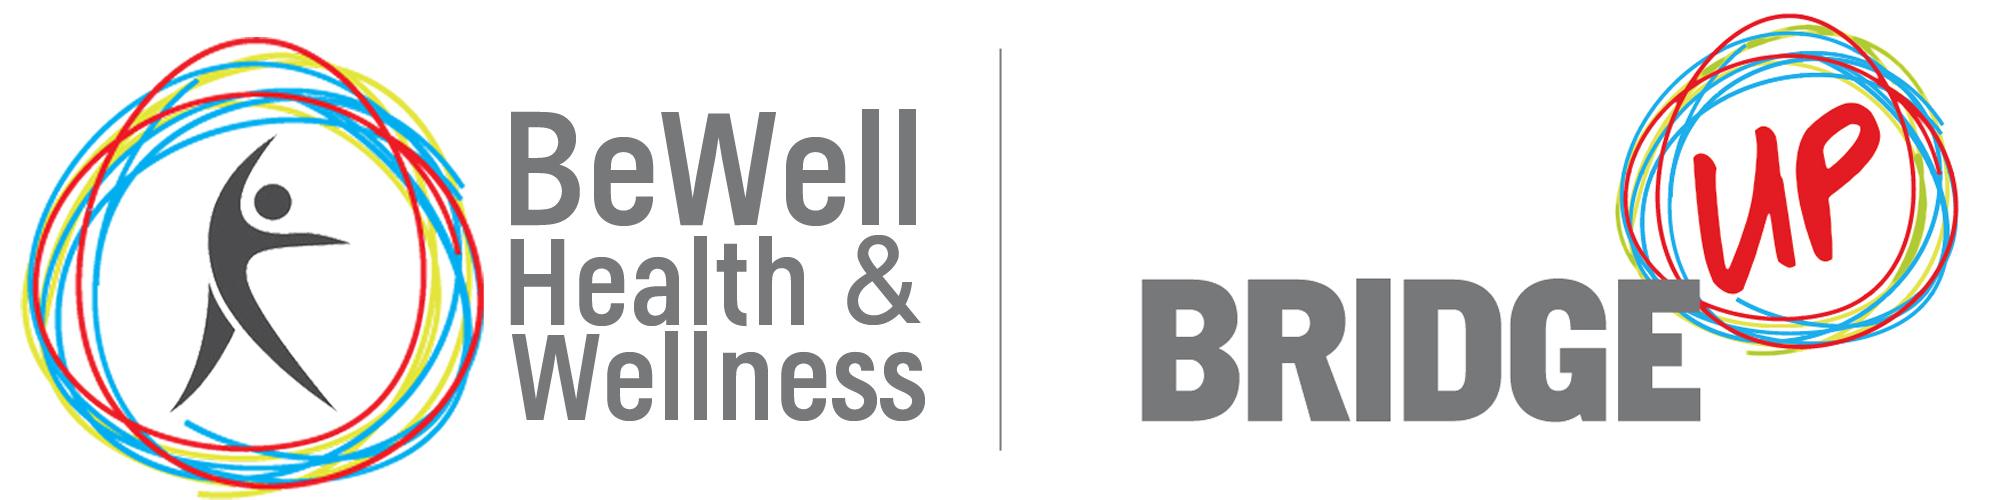 BeWell Health & Wellness